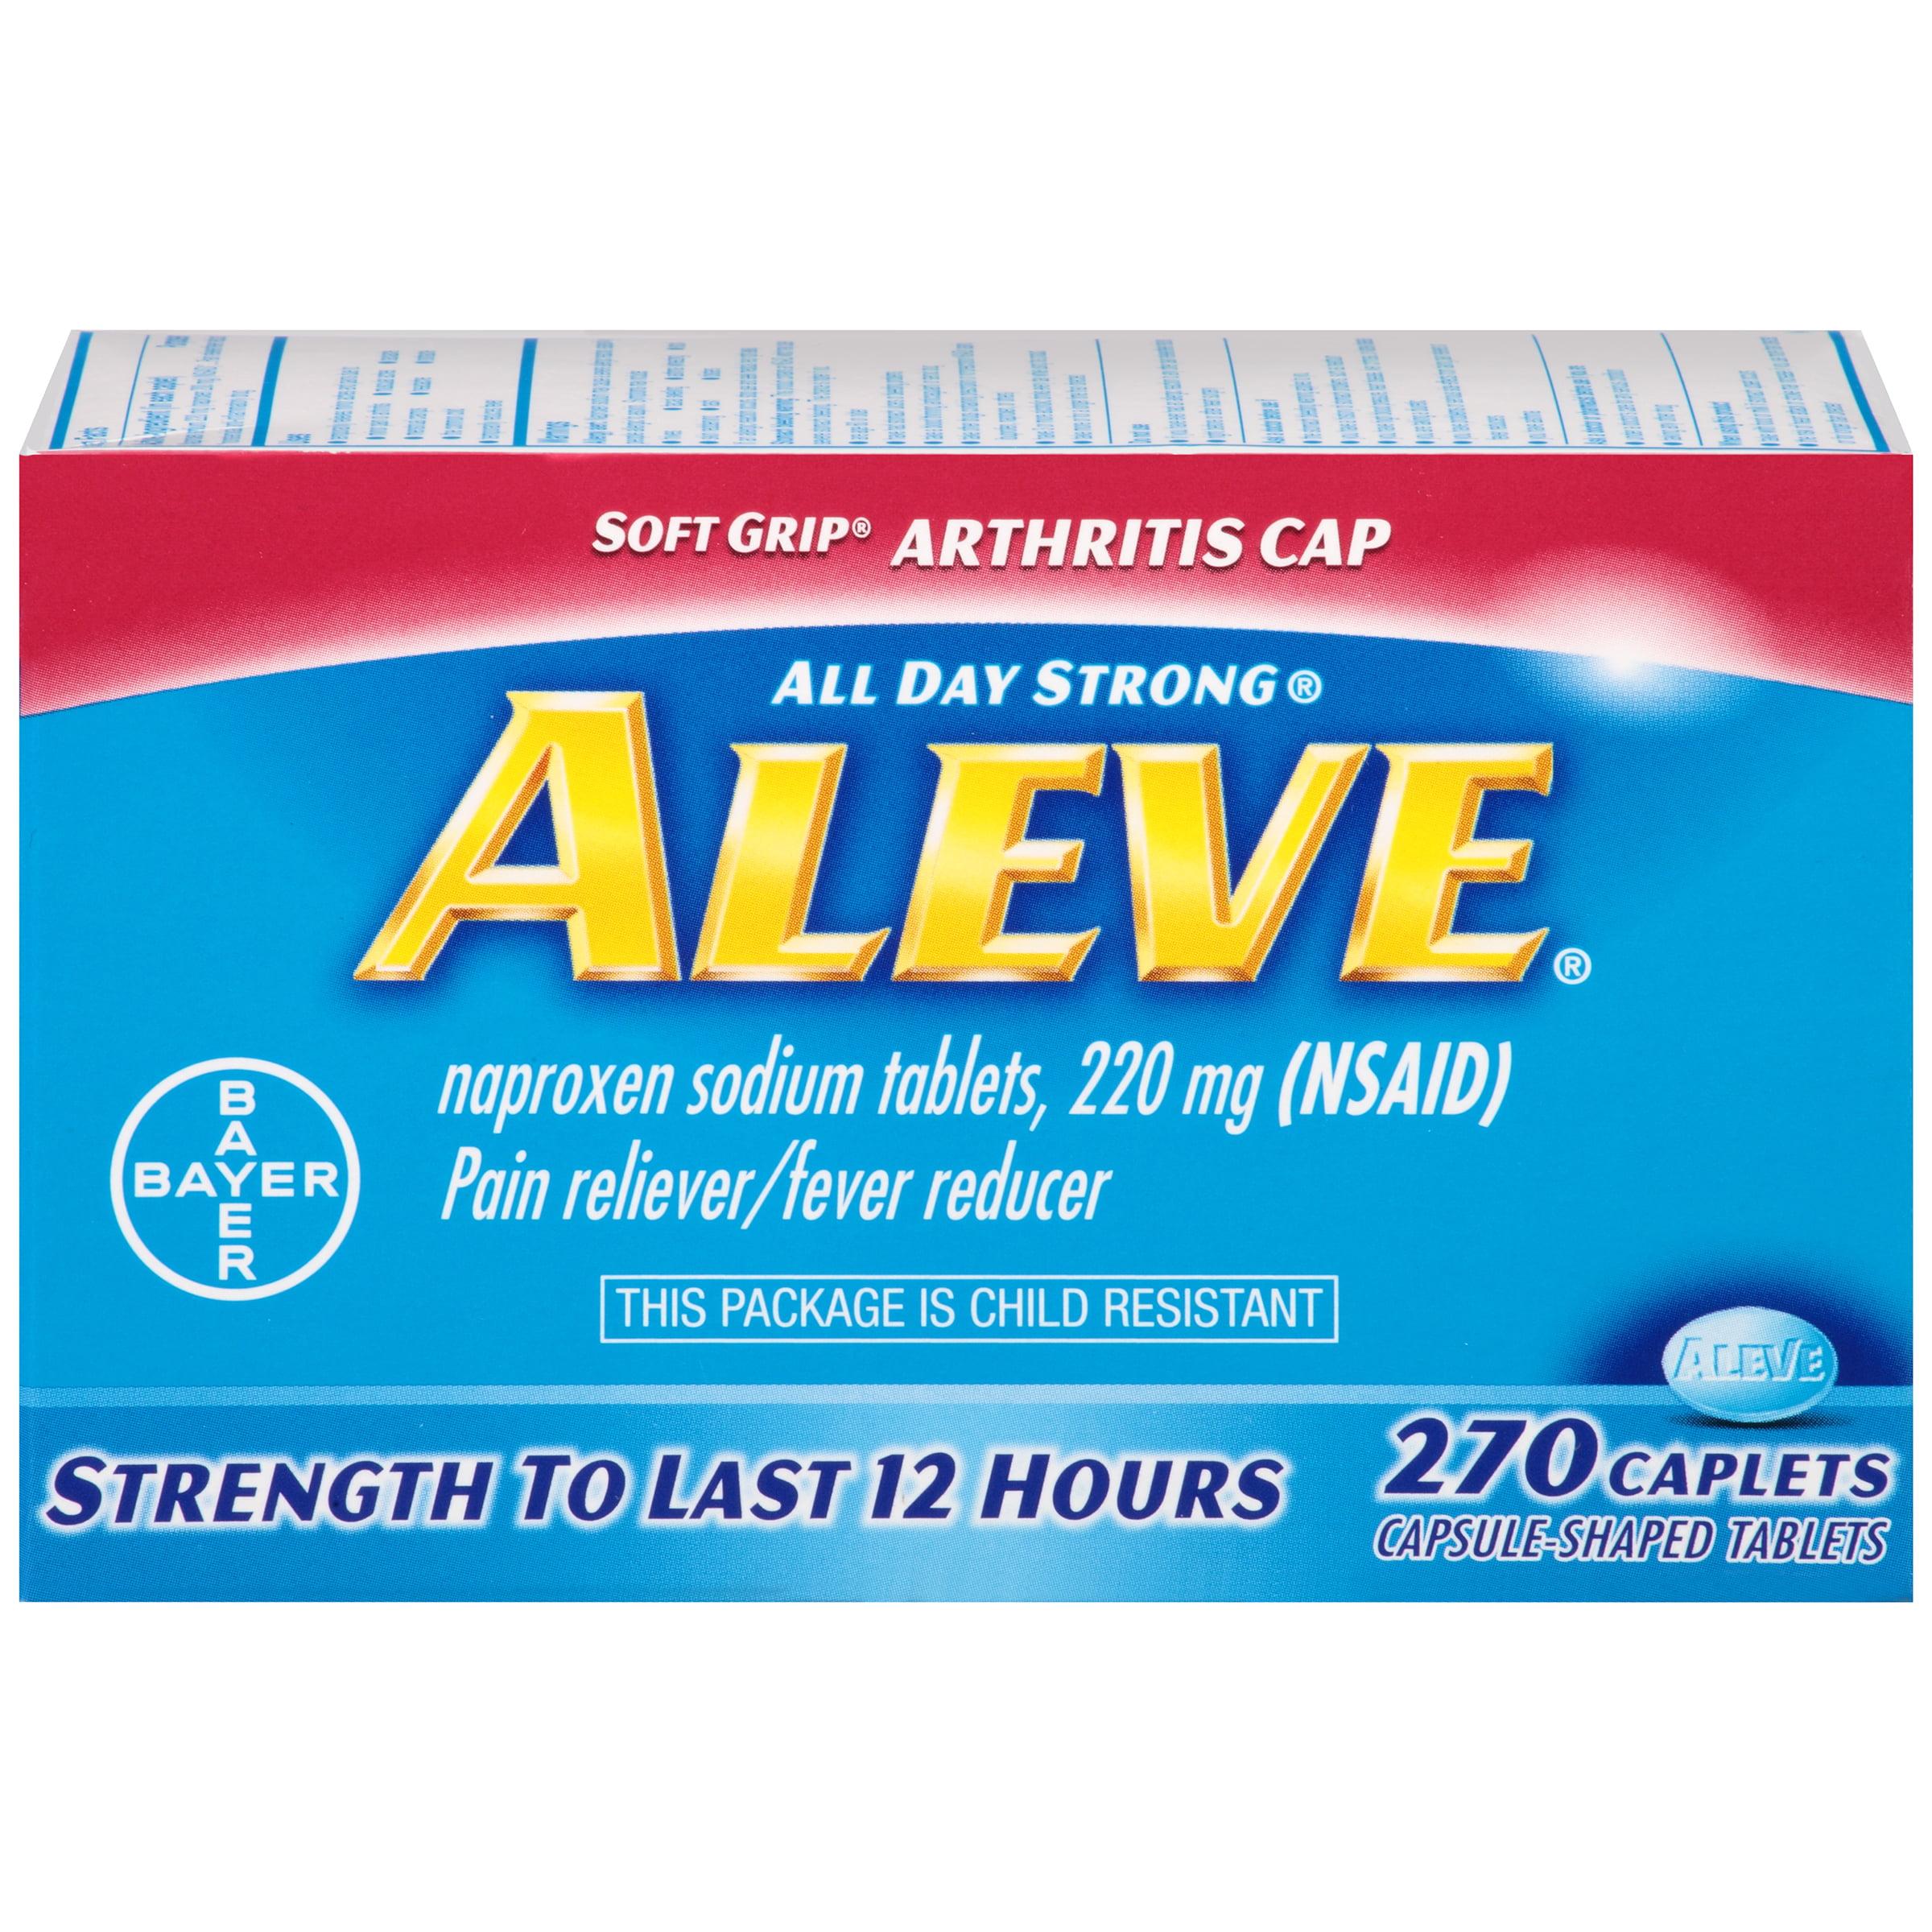 Aleve Soft Grip Arthritis Cap Pain Reliever/Fever Reducer Naproxen Sodium Caplets, 220 mg, 270 Ct